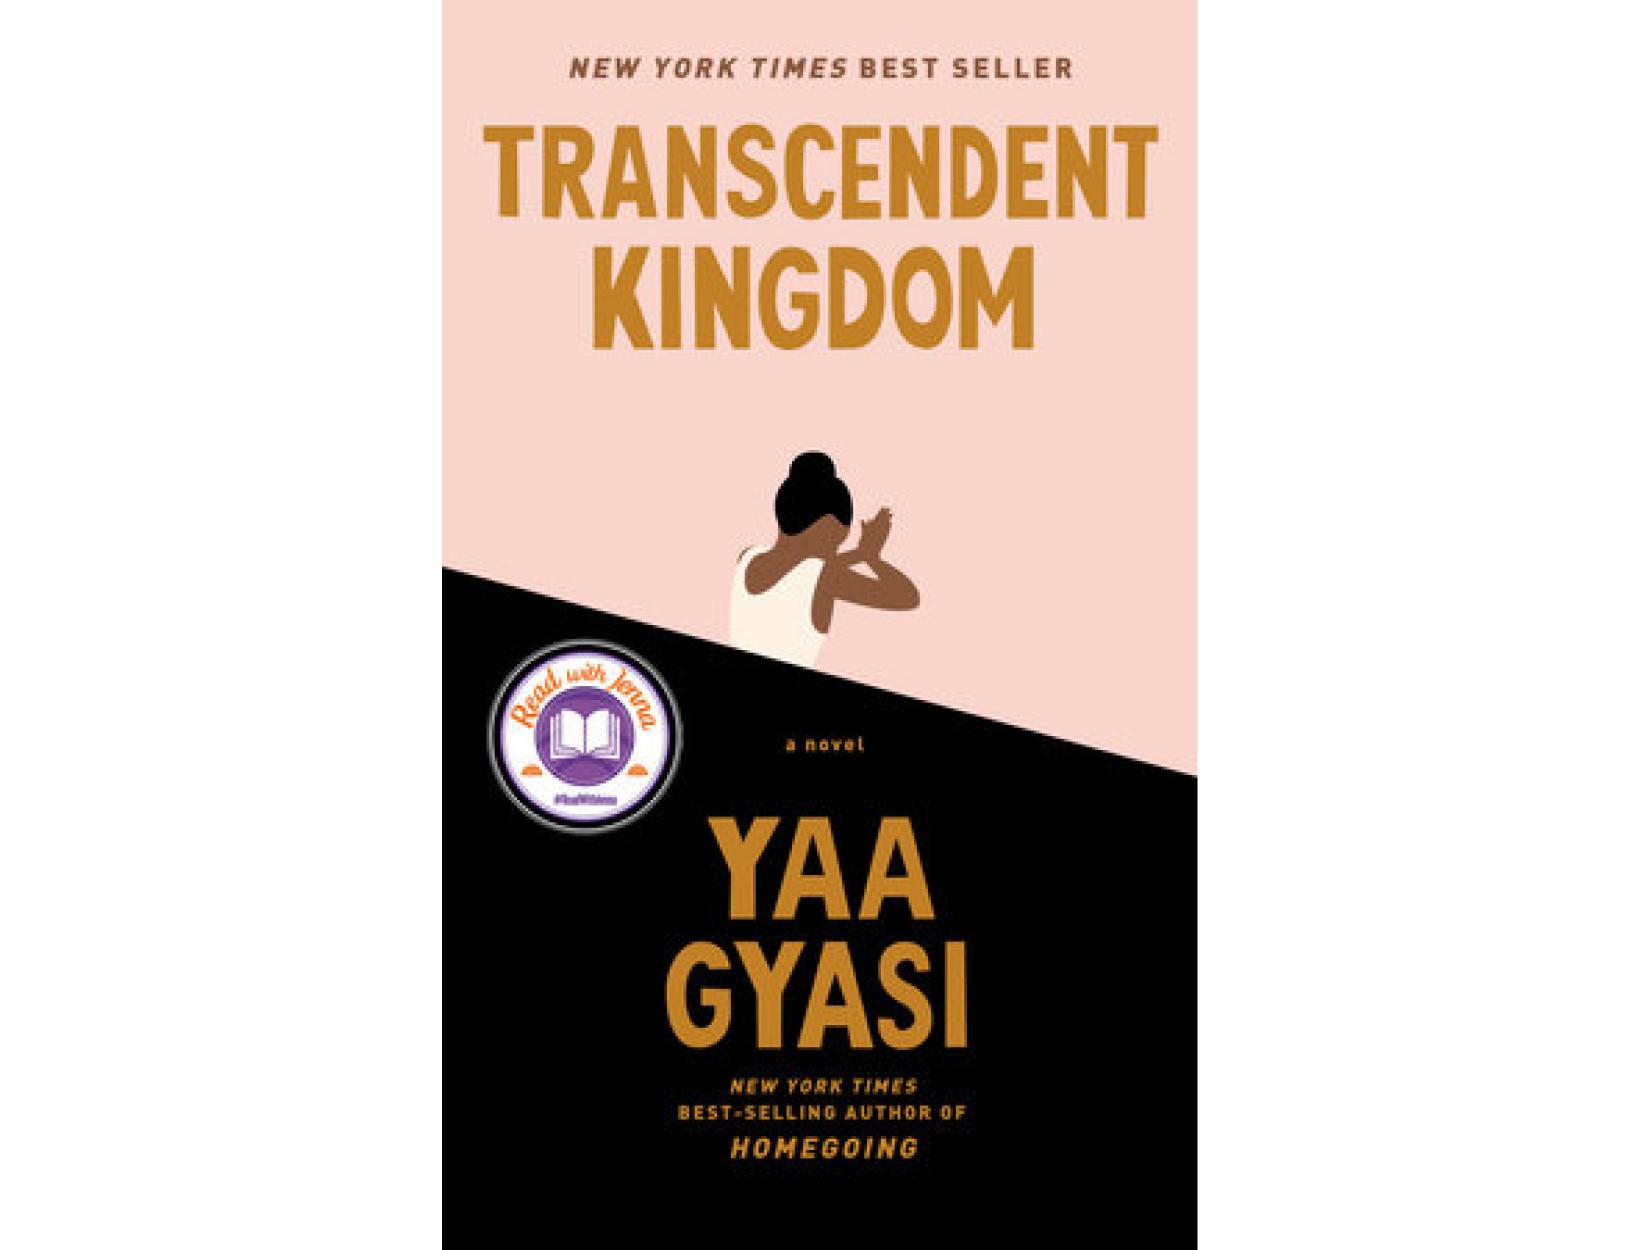 <em>Transcendent Kingdom</em> by Yaa Gyasi